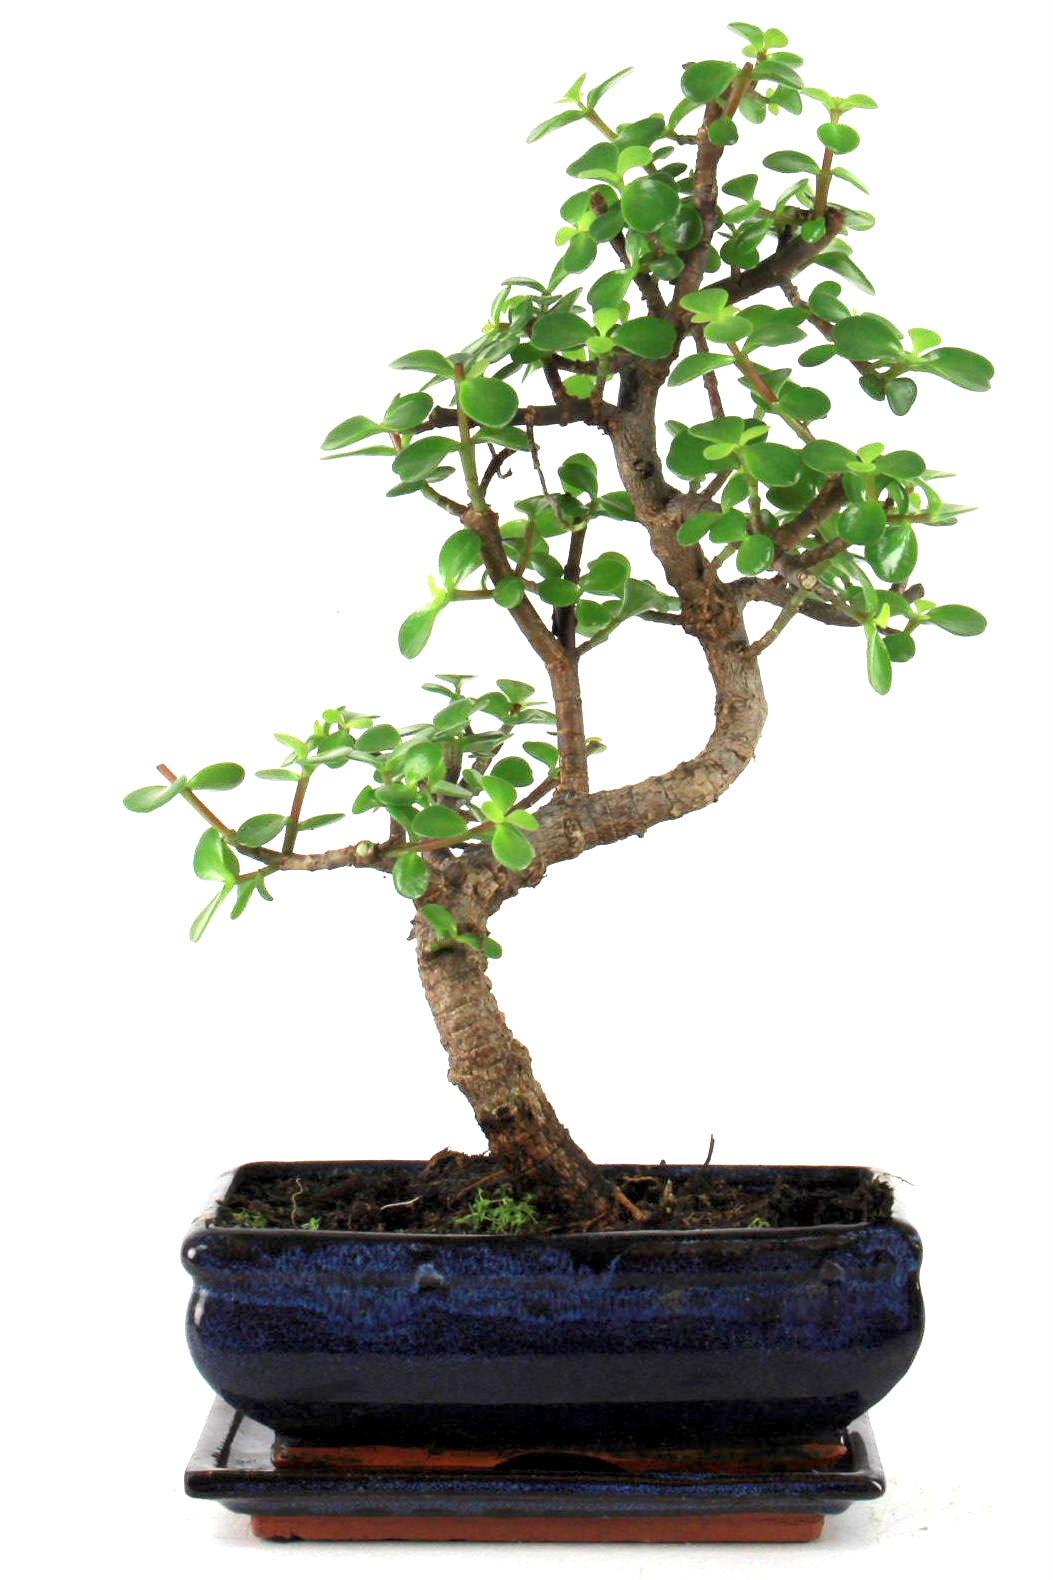 Dickblatt bonsai 35 40 cm s198 bei oyaki bonsai kaufen for Bonsai onlineshop